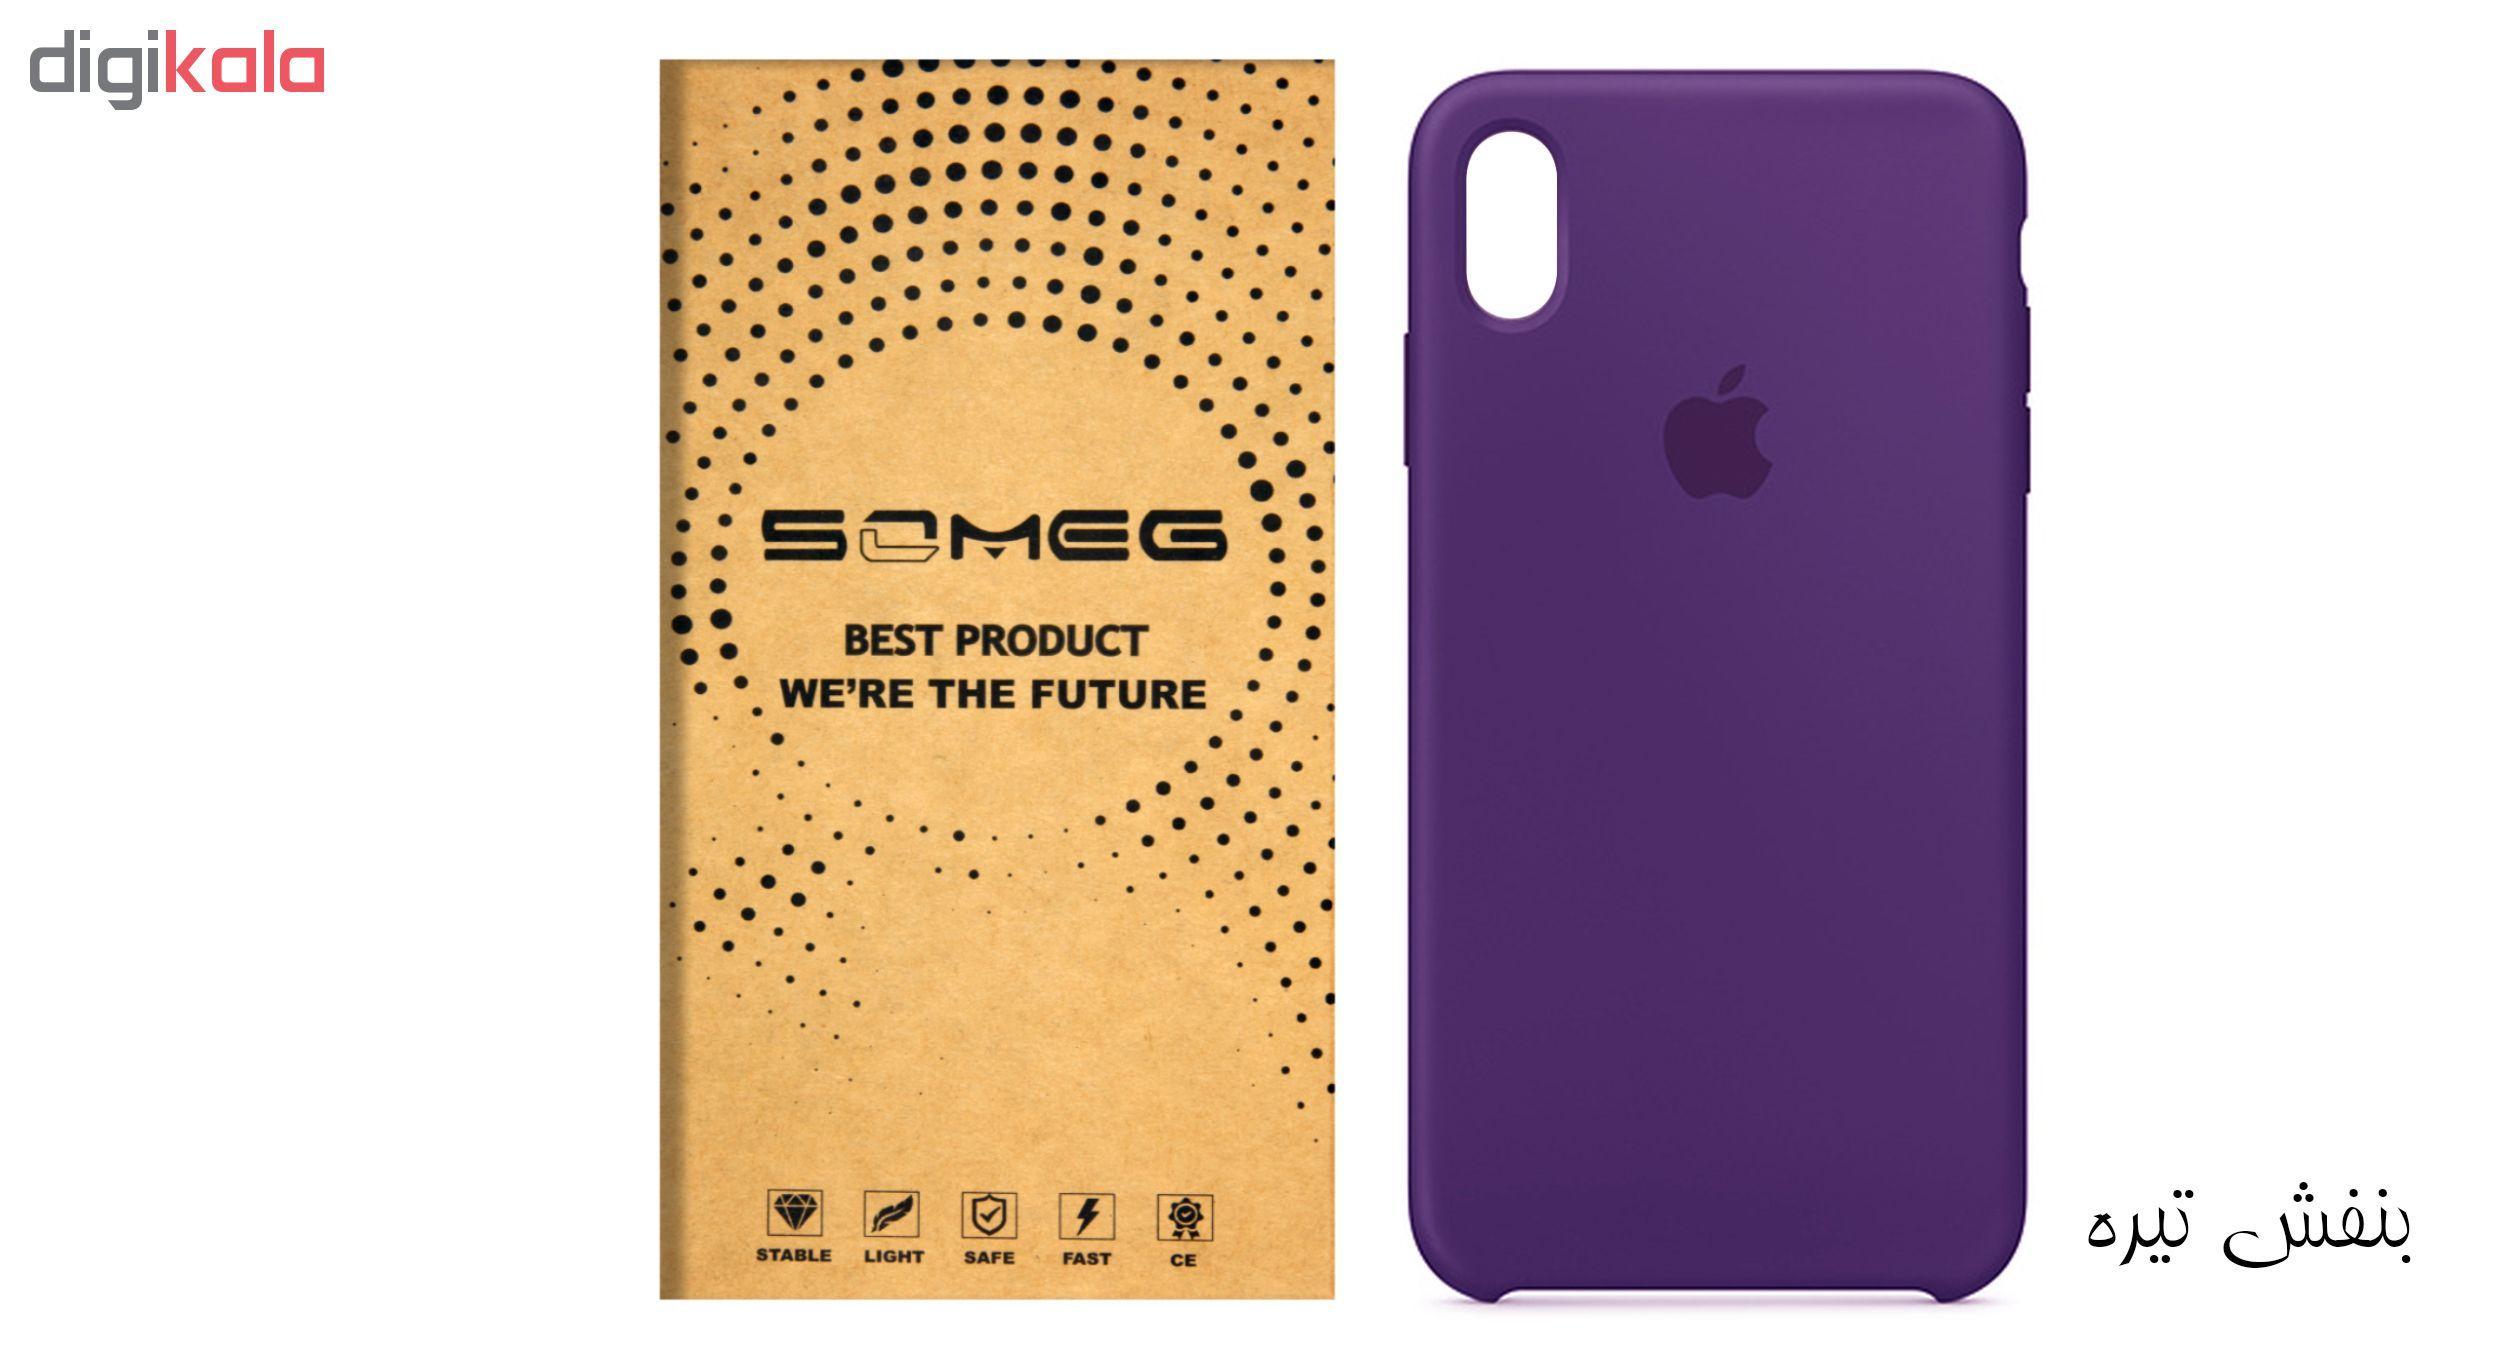 کاور سومگ مدل SIC مناسب برای گوشی موبایل اپل iPhone X  main 1 14